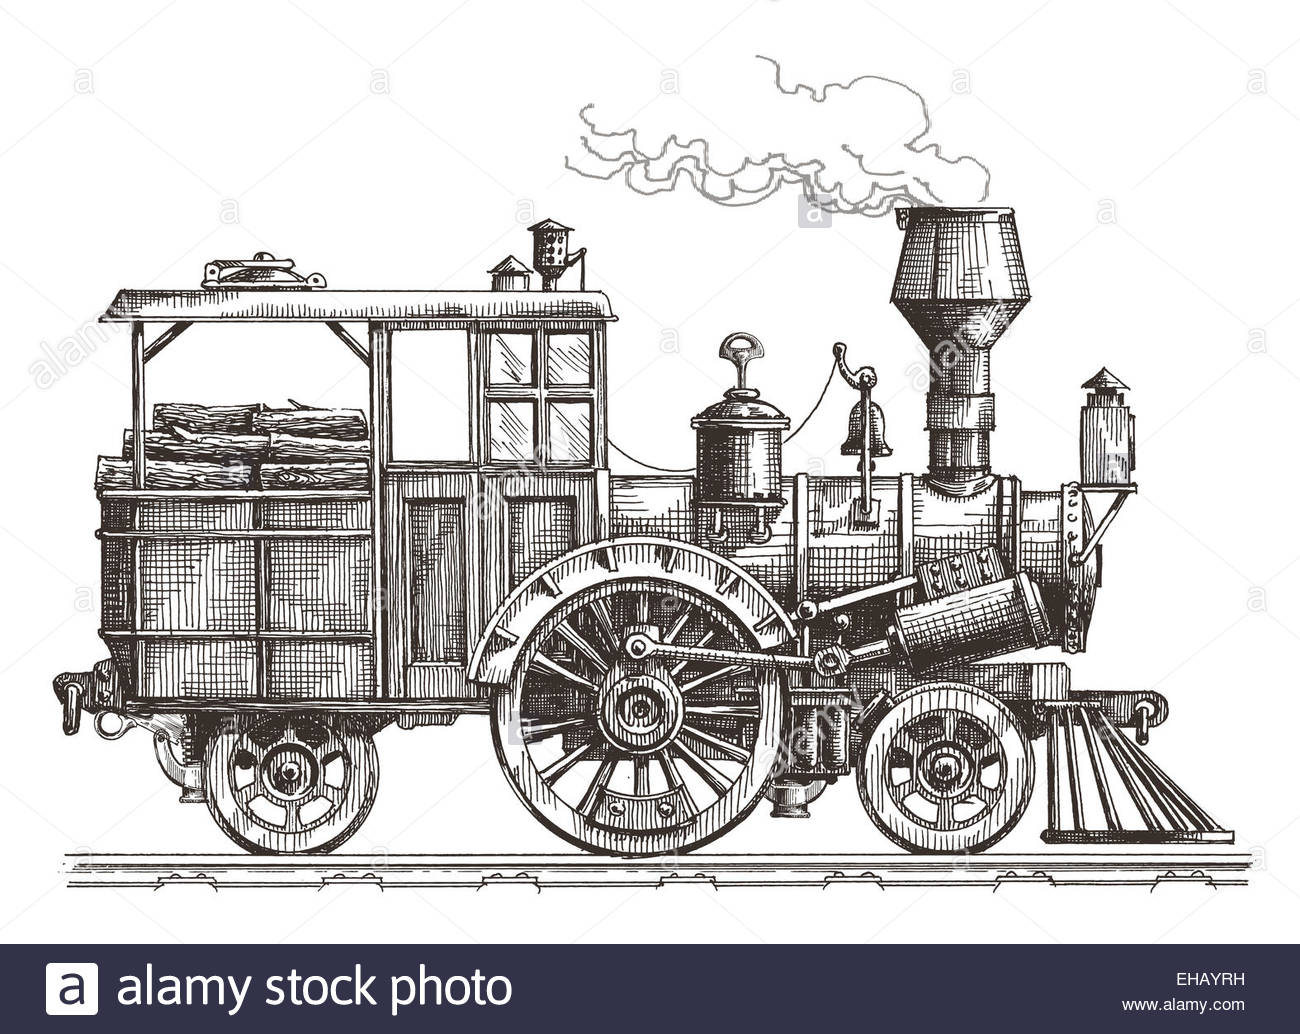 1300x1034 Vintage Steam Locomotive. Drawn Ancient Train, Transport. Vector